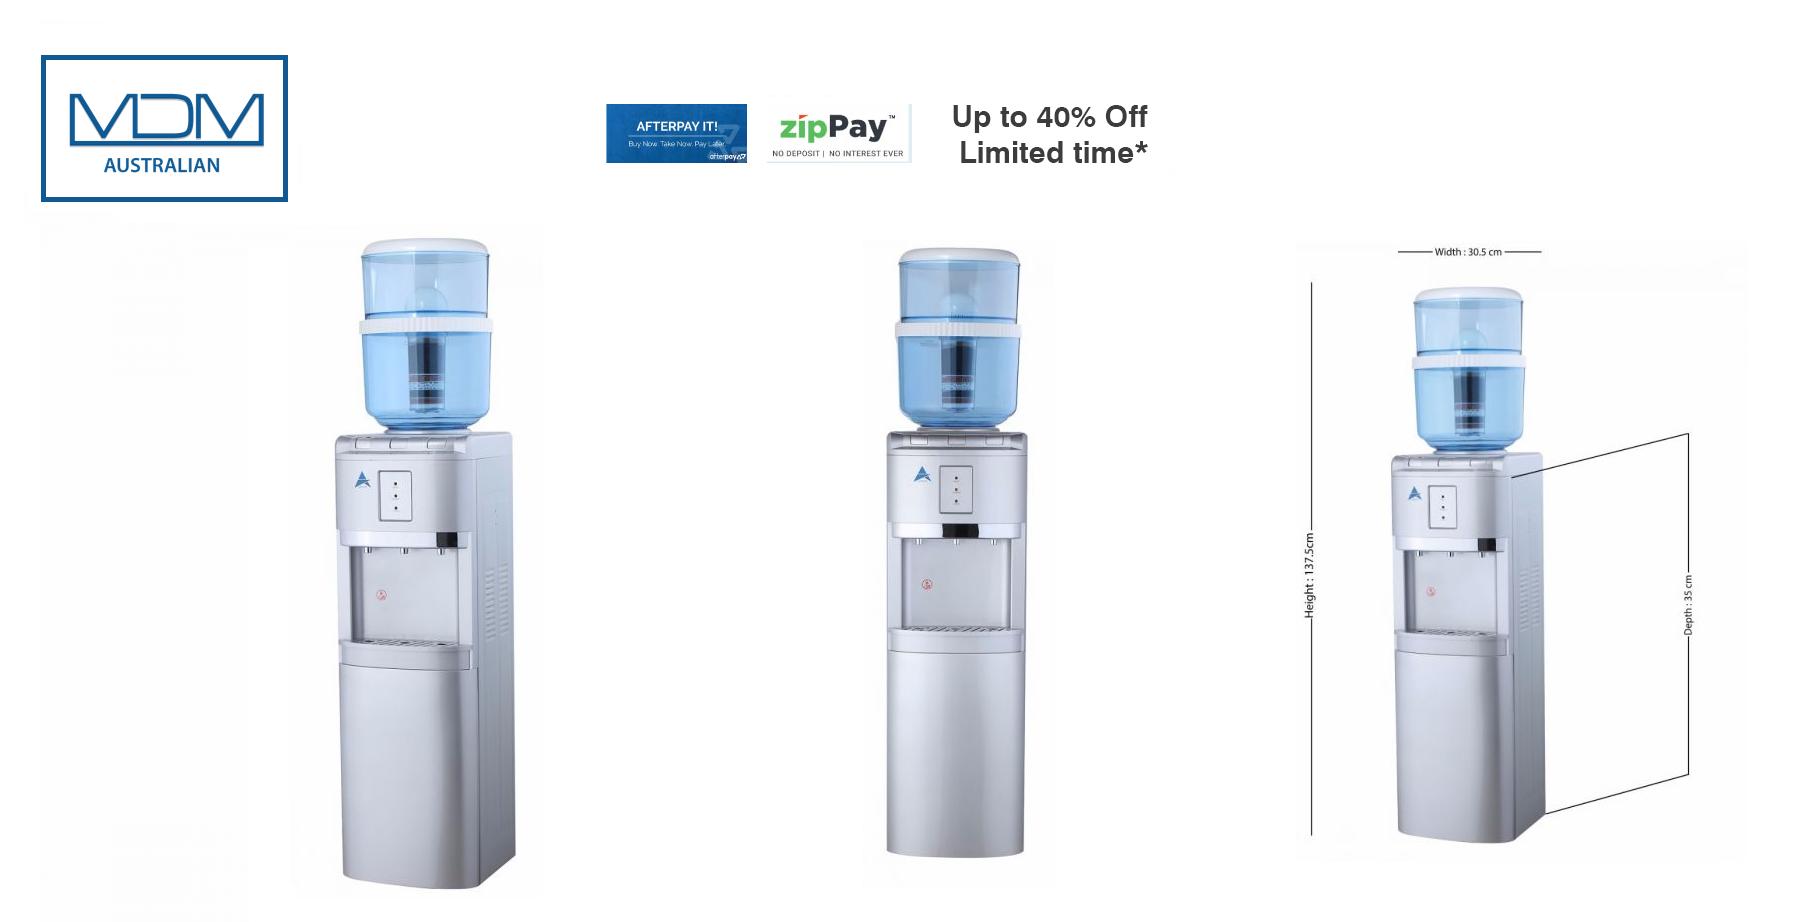 8 Stage Water Filter Dispenser Fluoride Reduction Control Kdf Maifan Stone 20l In 2020 Fluoride Water Filter Fluoride Water